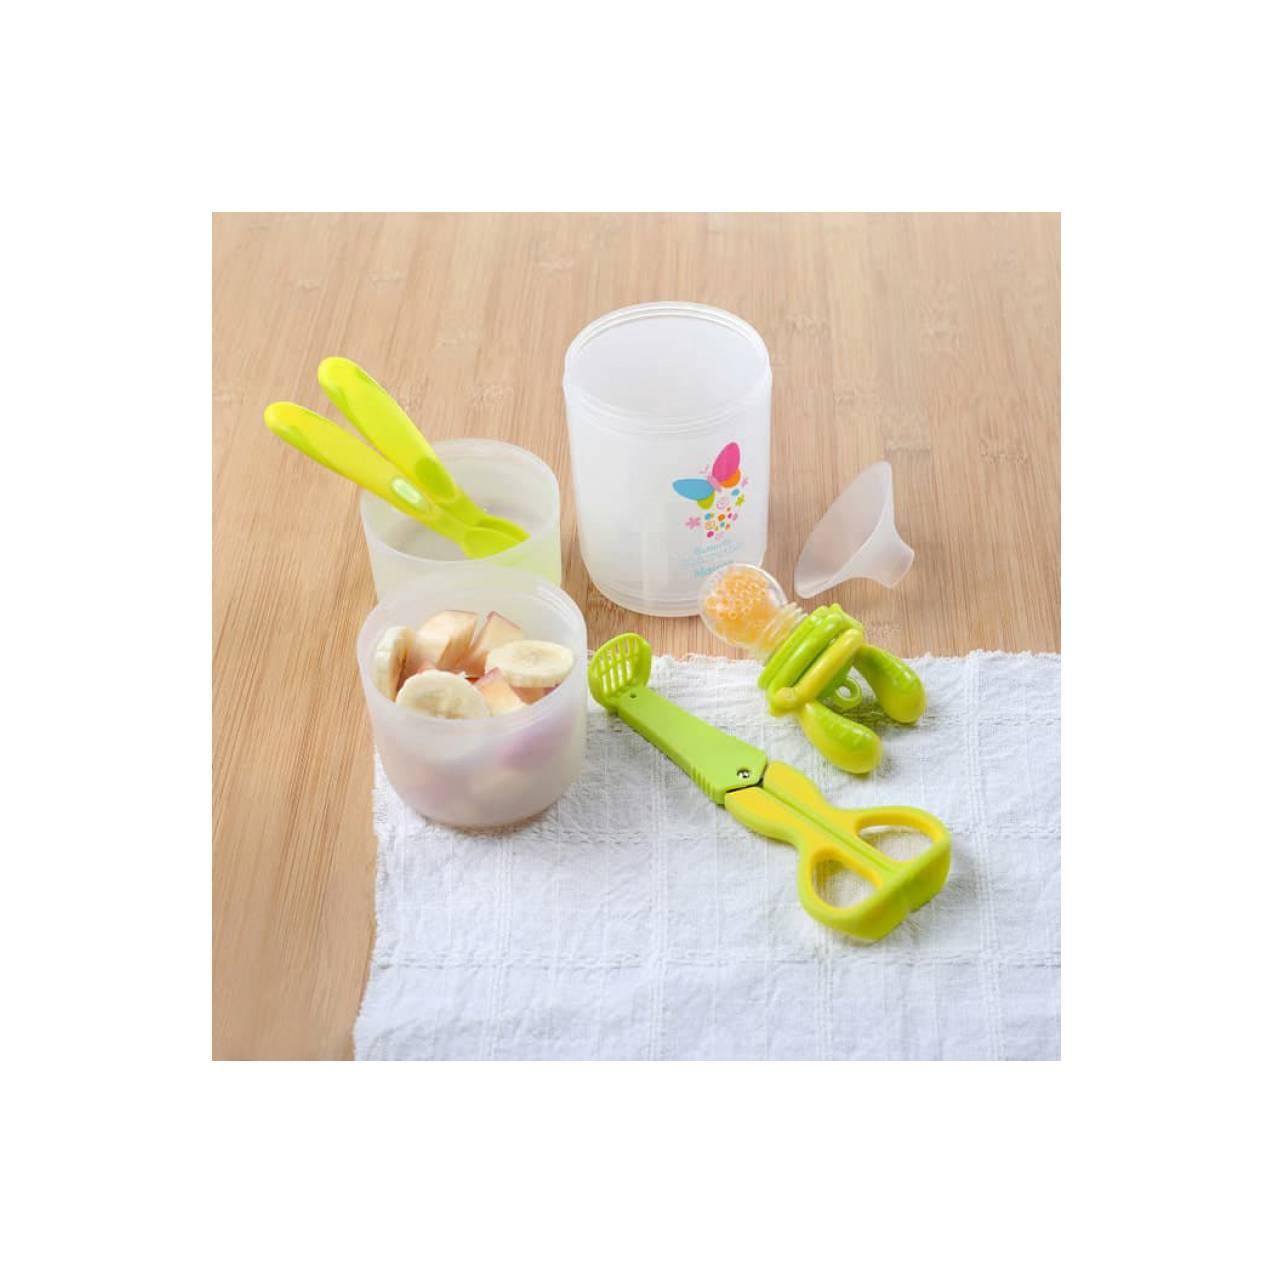 Harga kidsme travel easy set baby food maker alat mpasi food | HARGALOKA.COM